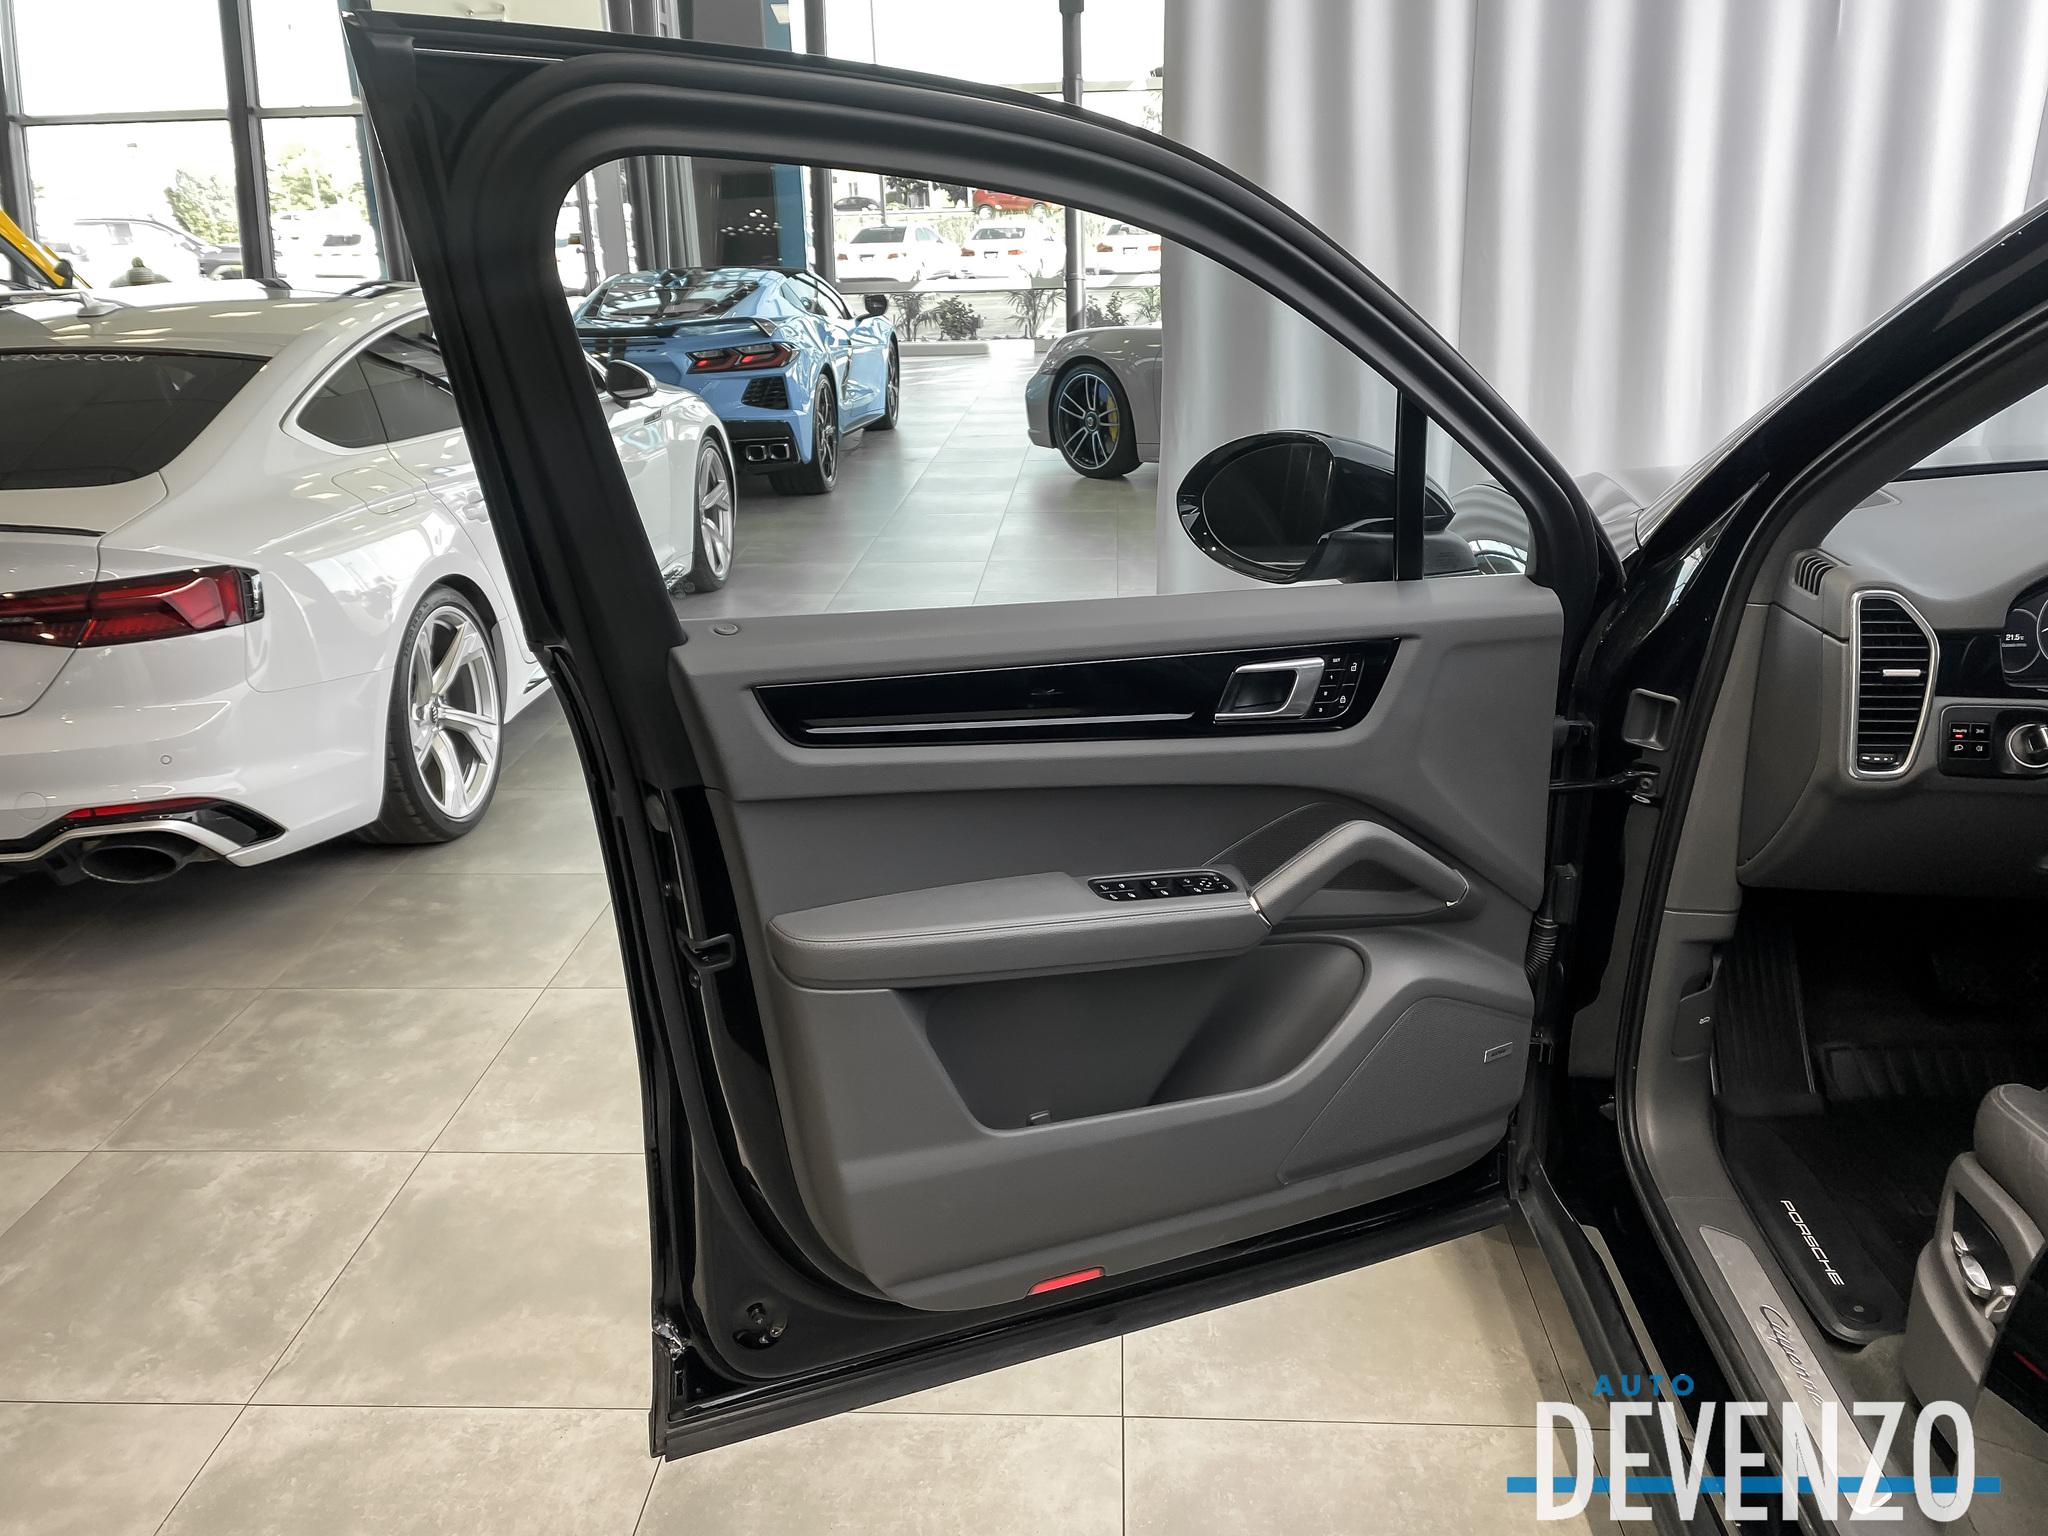 2019 Porsche Cayenne AWD PREMIUM PACKAGE 20» SPORT WHEELS complet